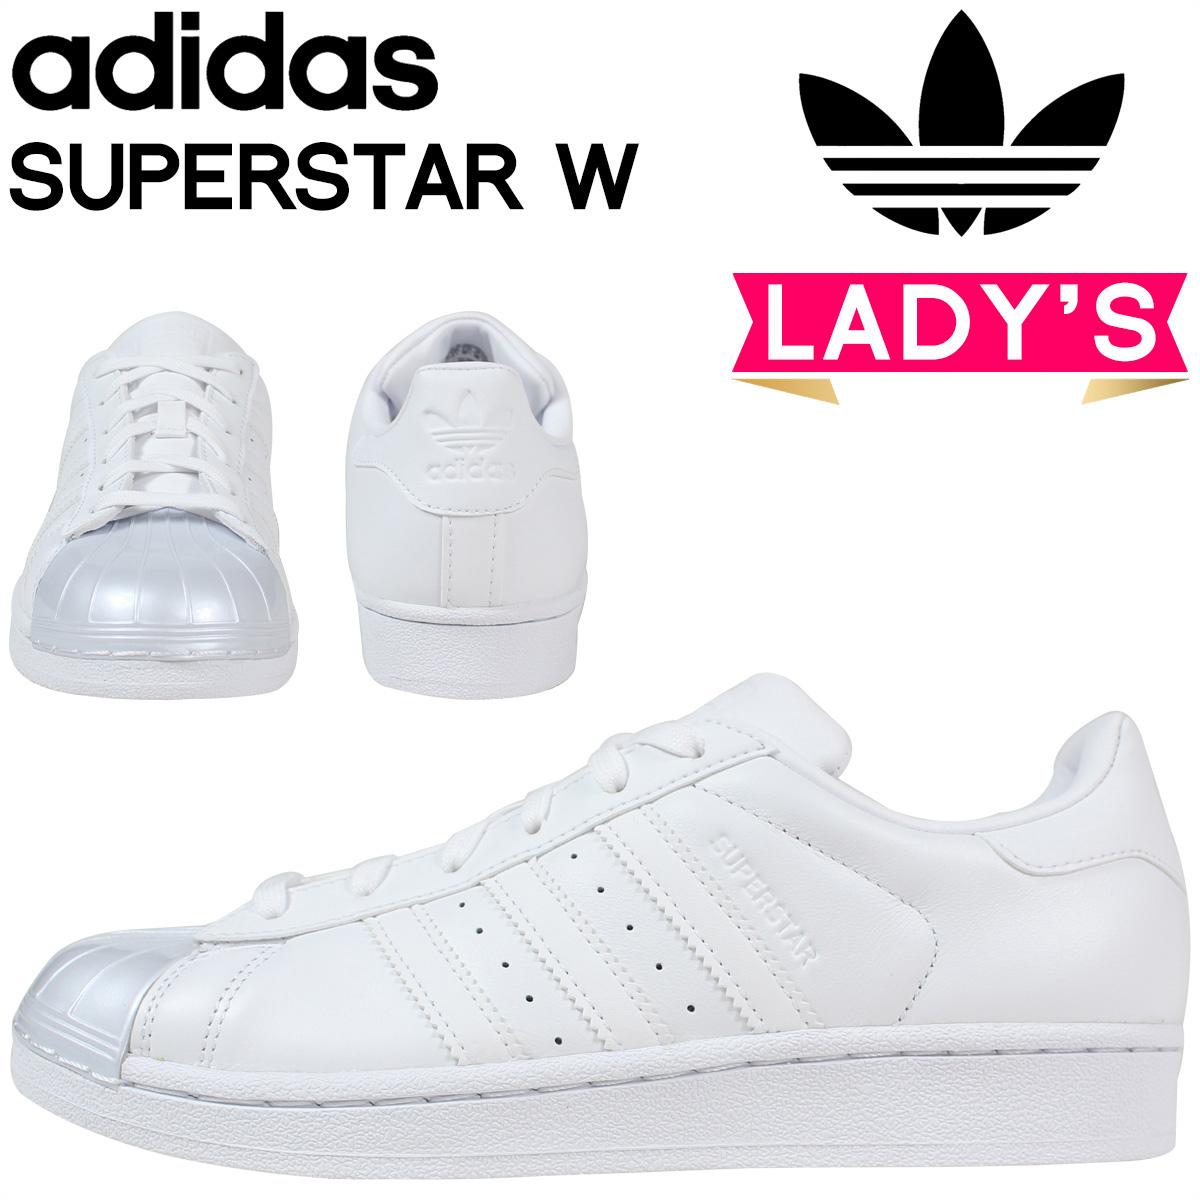 adidas Originals Men's Superstar 80s Primeknit, Cblack